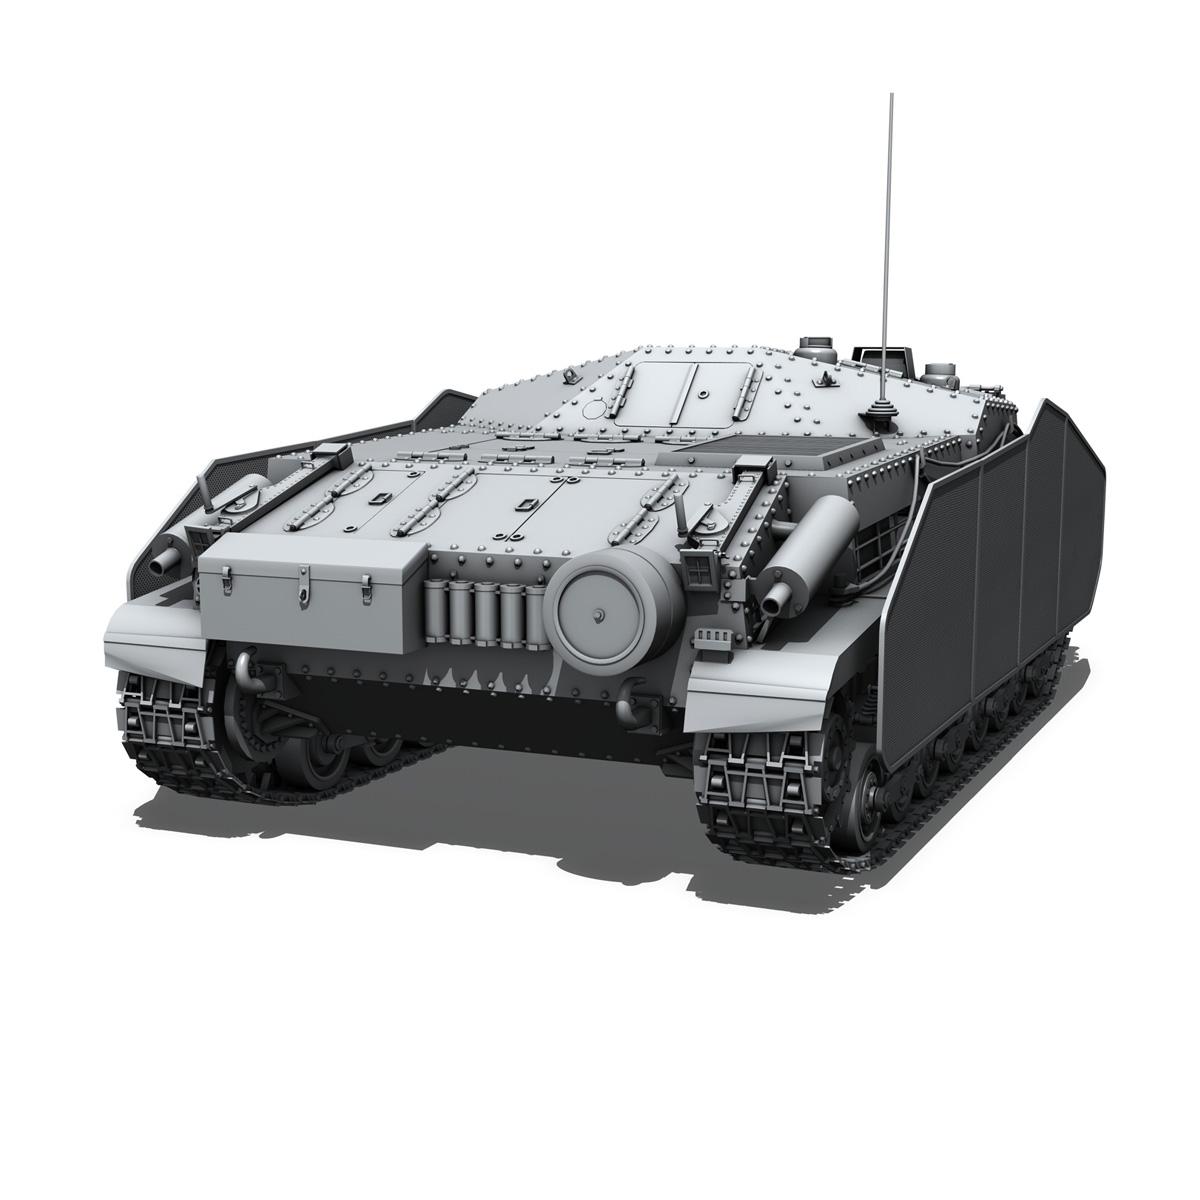 43m zrinyi ii - Macar hücum silahı 3d model 3ds fbx c4d lwo obj 251633